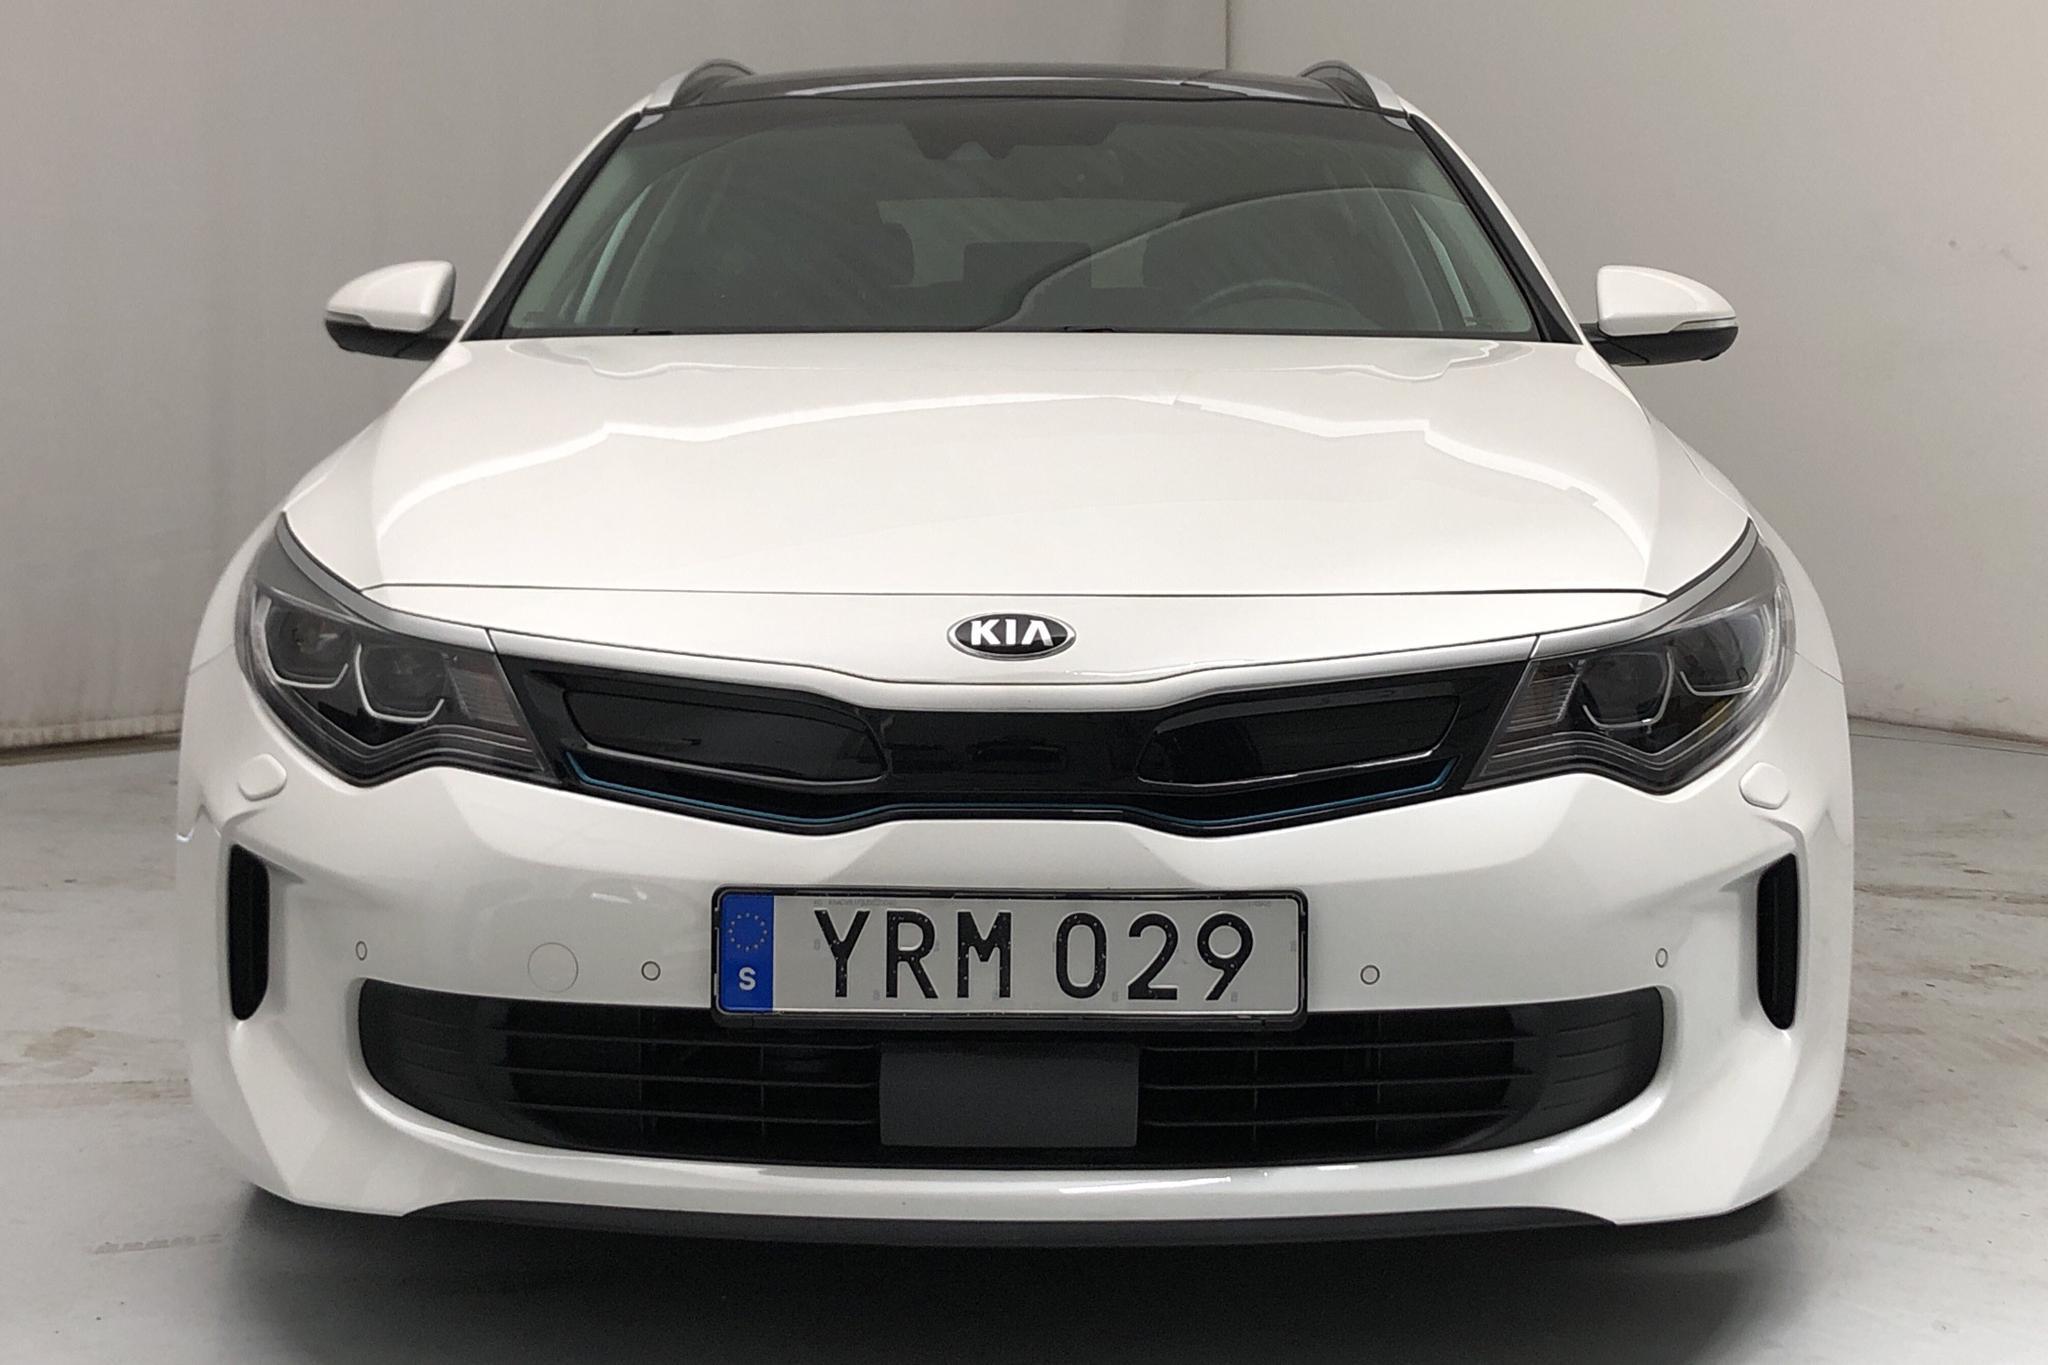 KIA Optima 2.0 GDi Plug-in Hybrid SW (205hk) - 51 880 km - Automatic - white - 2018